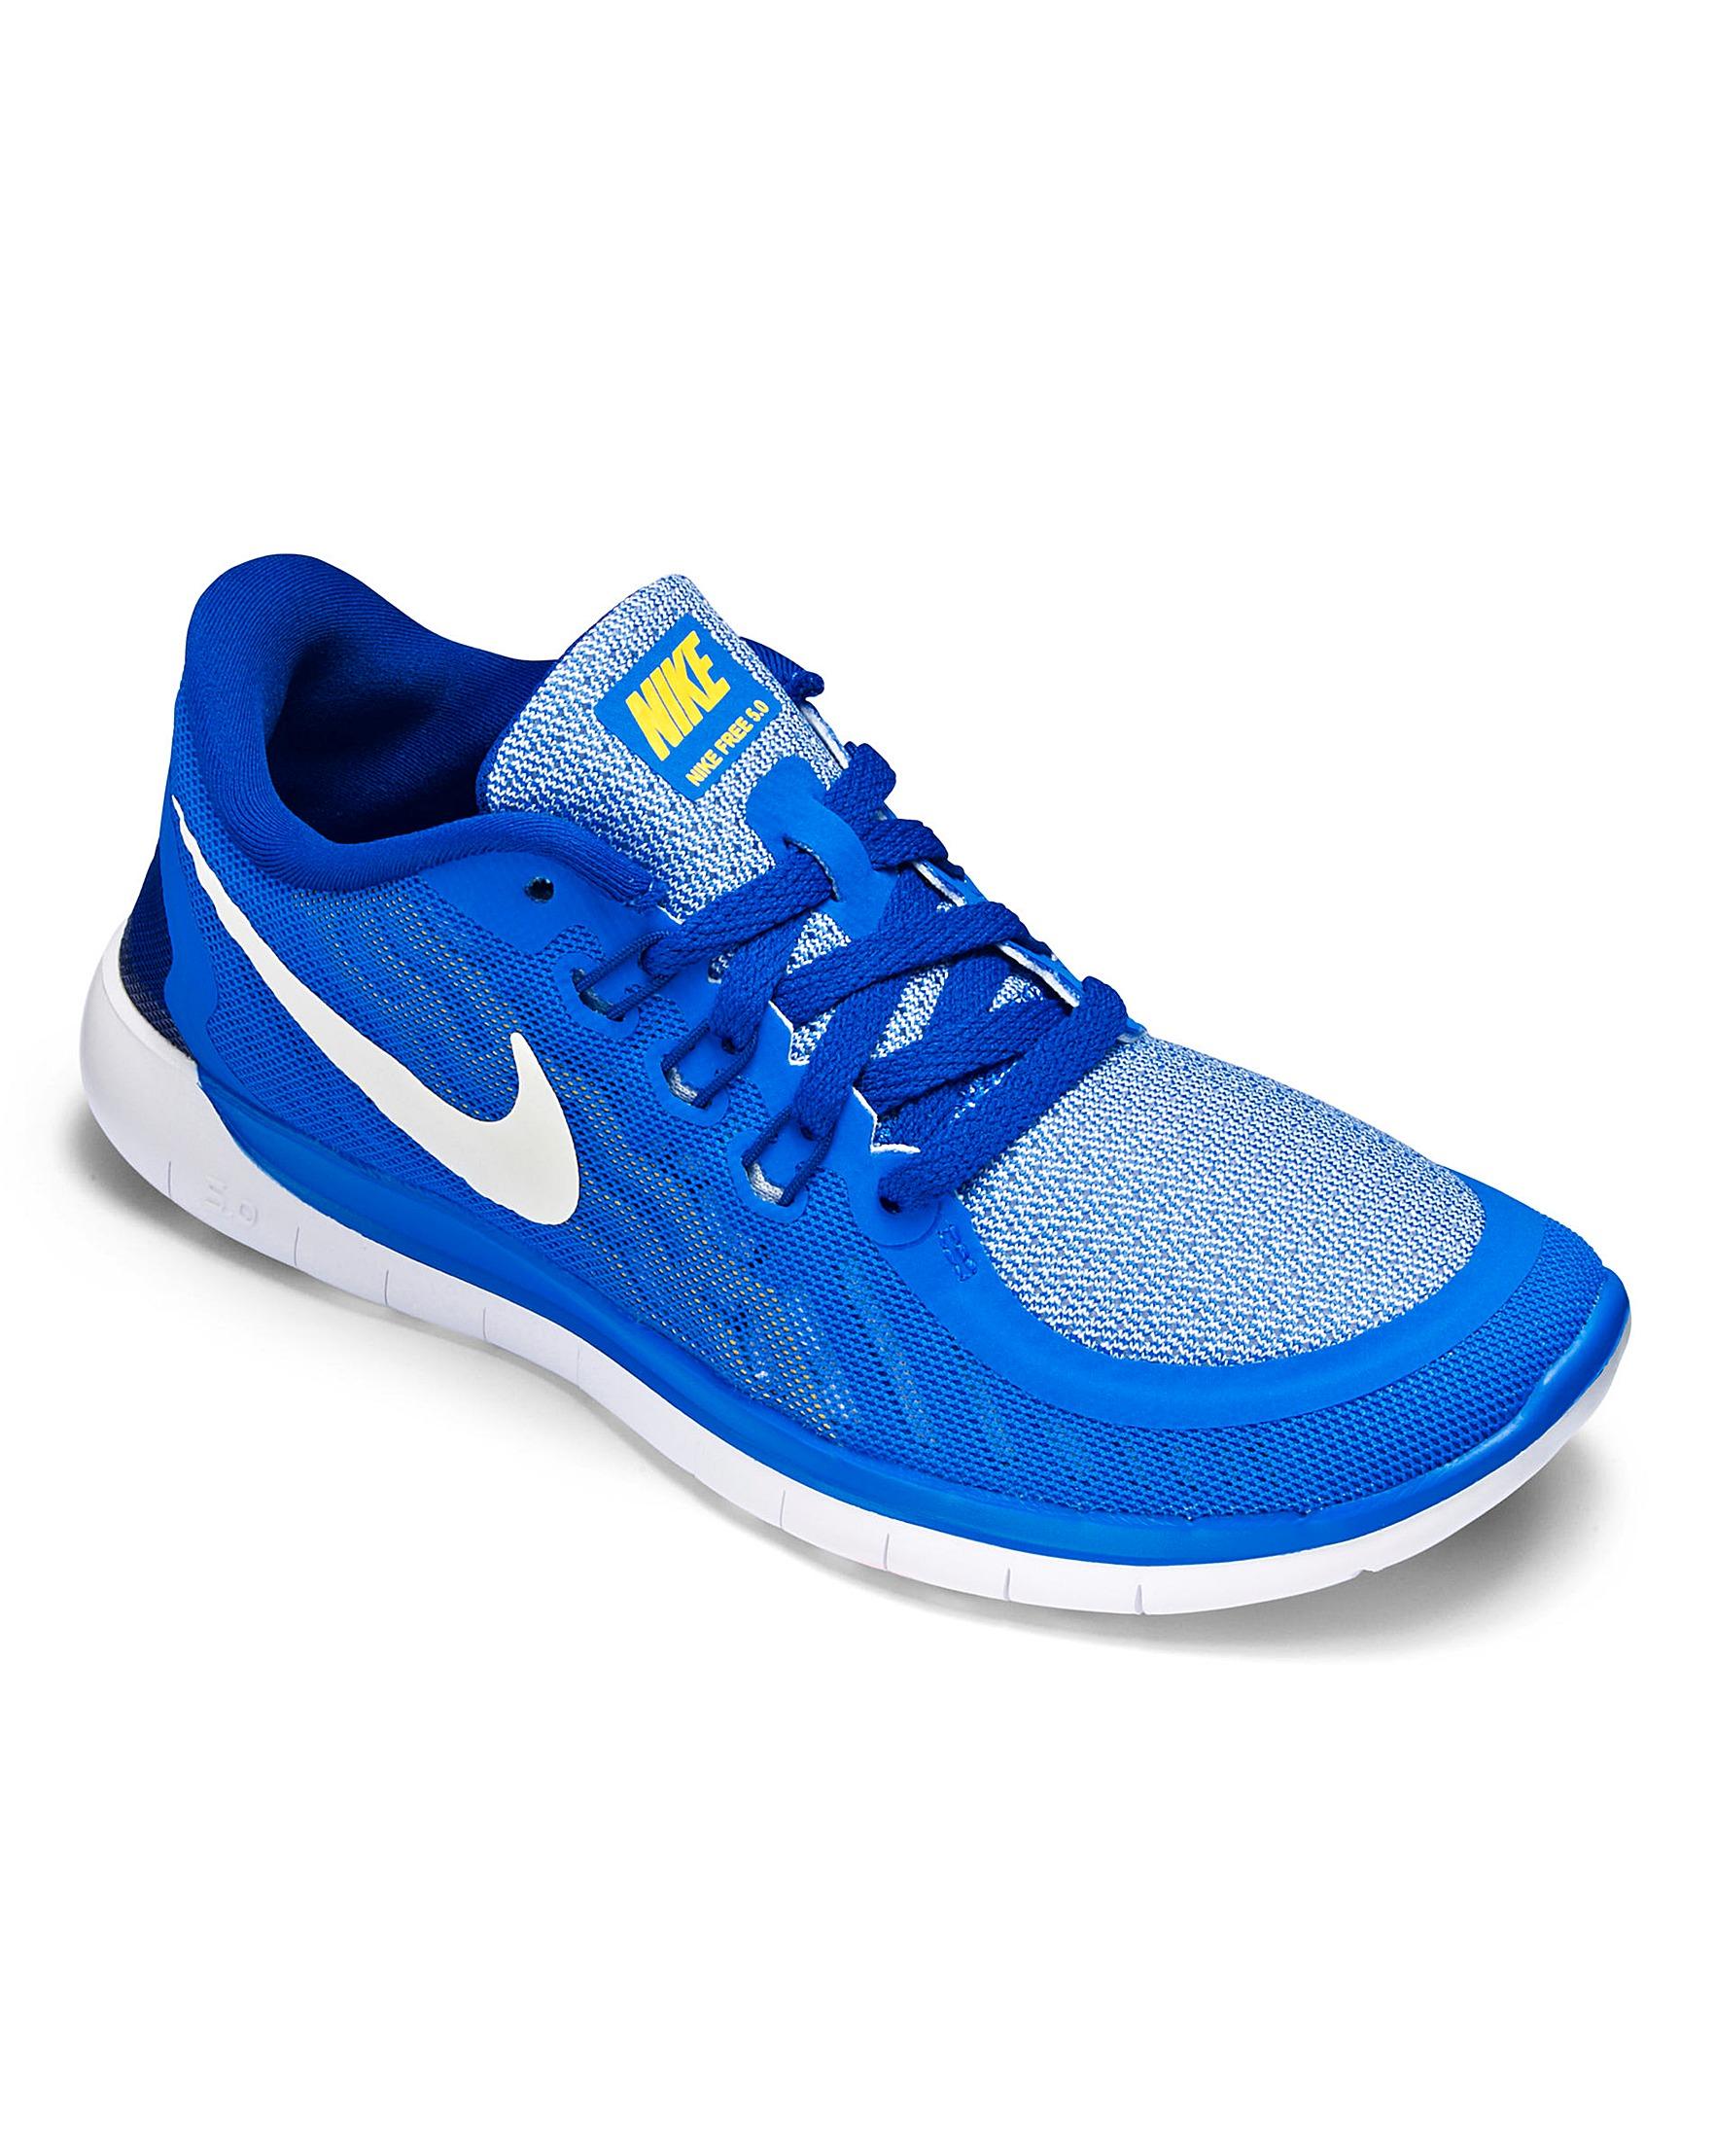 buy popular 43c5f cb18c ... get nike free run 5 junior trainers j d williams 5d47e 65d81